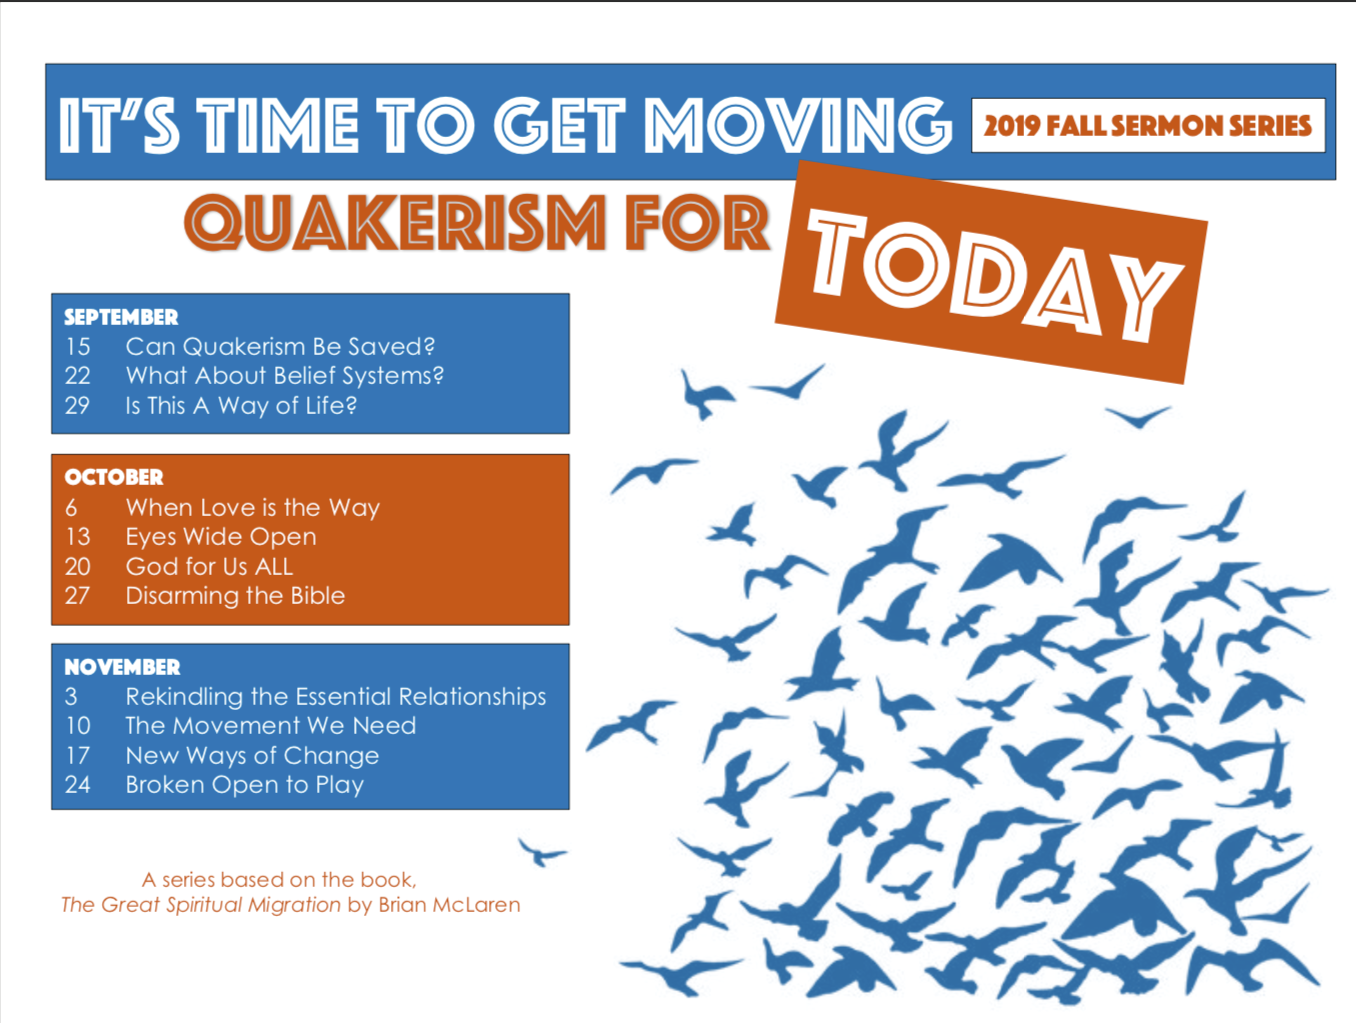 quakerismtoday.png